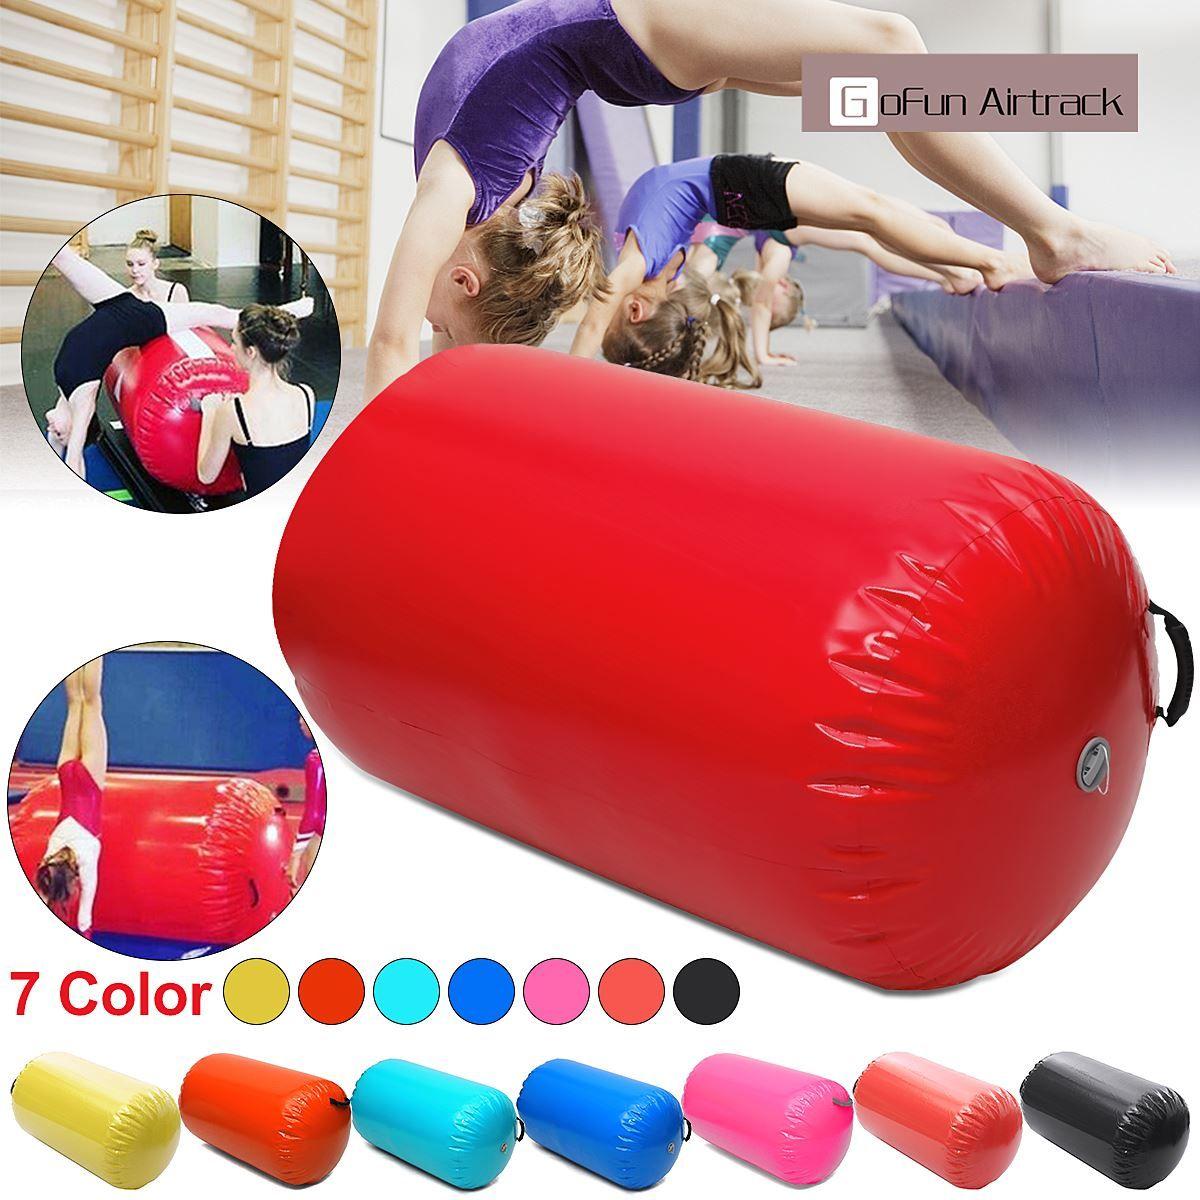 Gofun AirTrack Air Cylinder Tumbling Track Gymnastics Exercise Column Inflatable Gym Inverted Backflip Training Children Safe